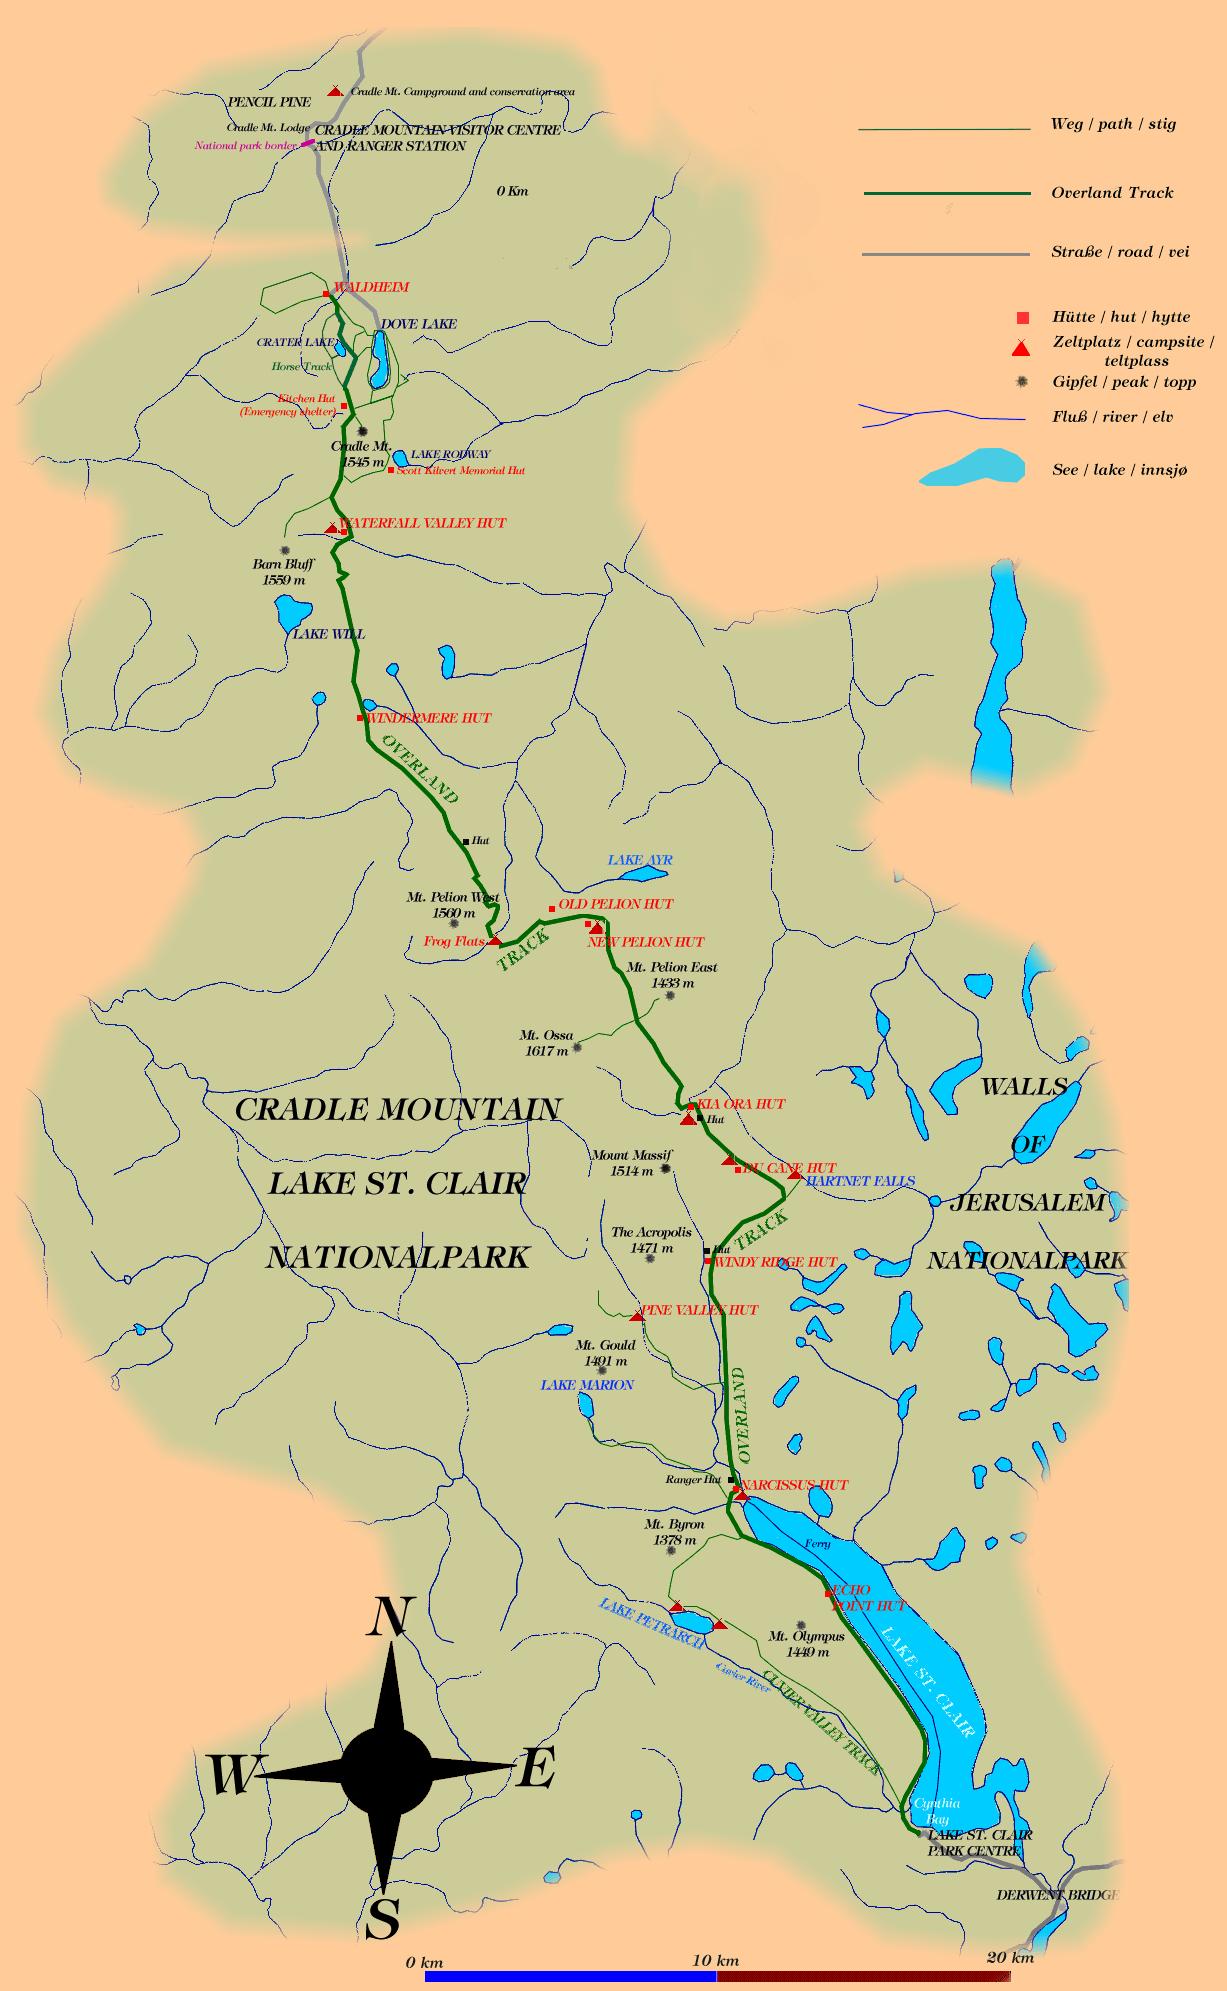 Map Of Australia And Tasmania.Overland Track Map Google Search Travel Australia In 2019